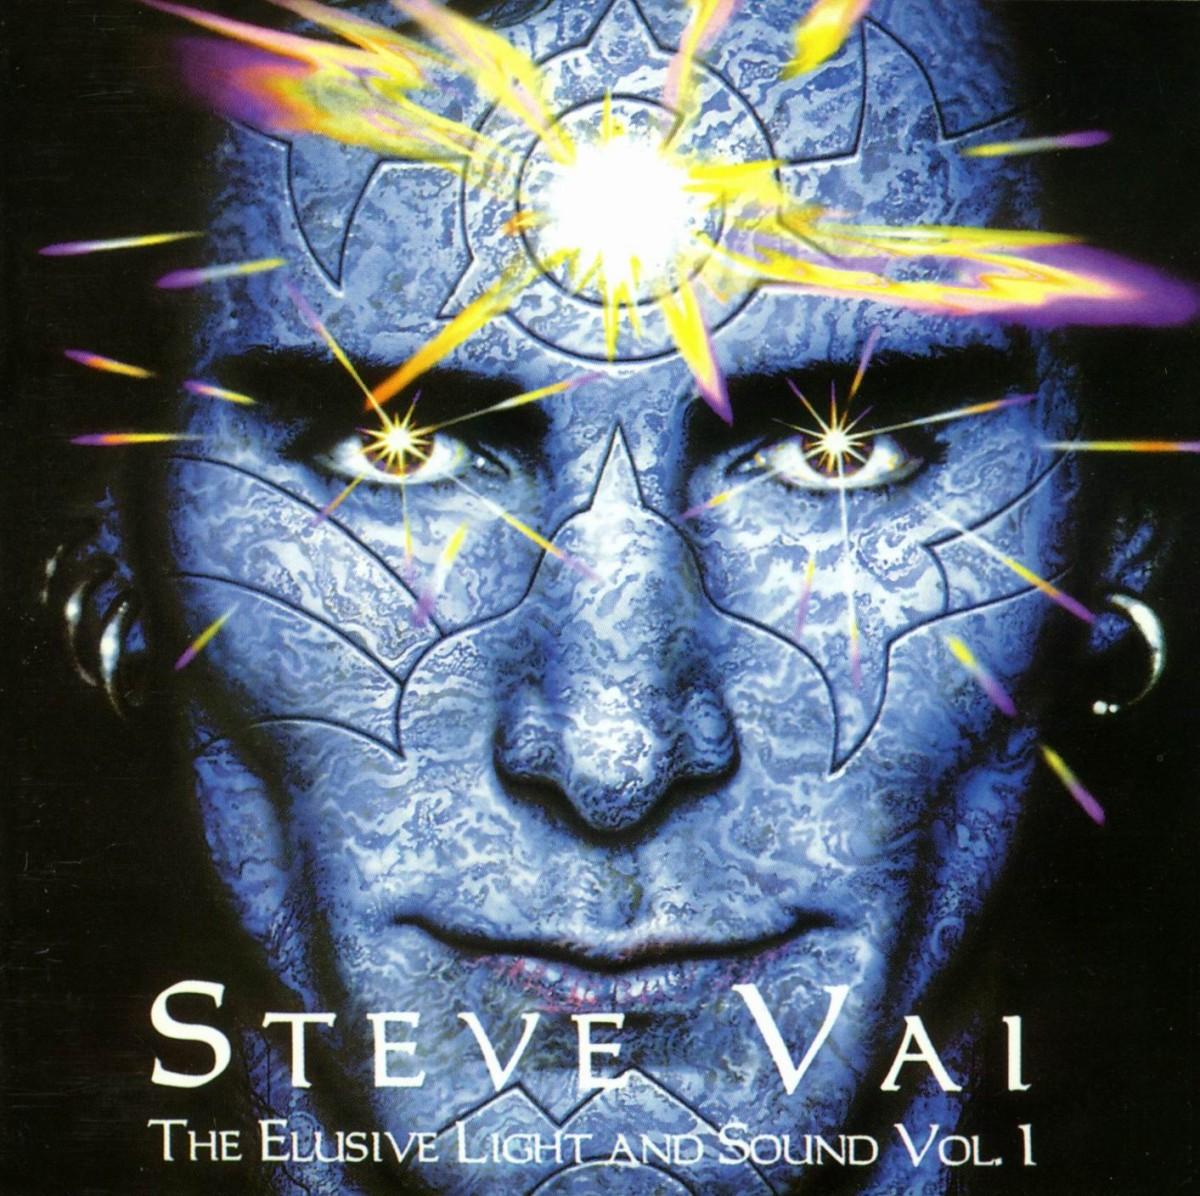 stevevai.it - Steve Vai - The Elusive light and sound vol. 1